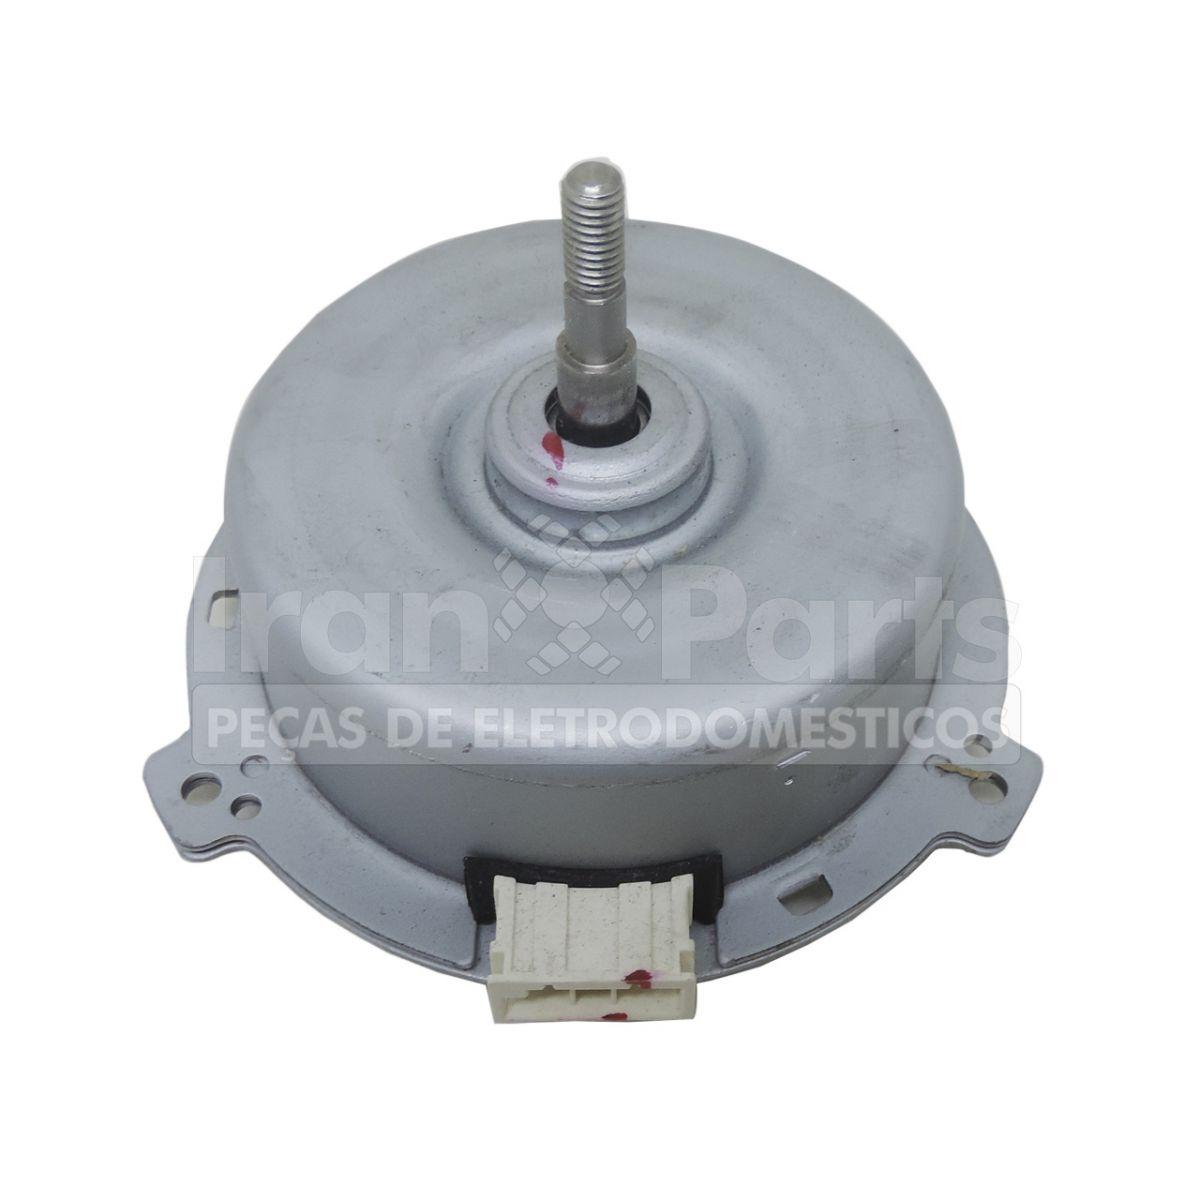 Motor Ventilador Lava E Seca Electrolux Lse11 Lse12 Lsi09 Ls